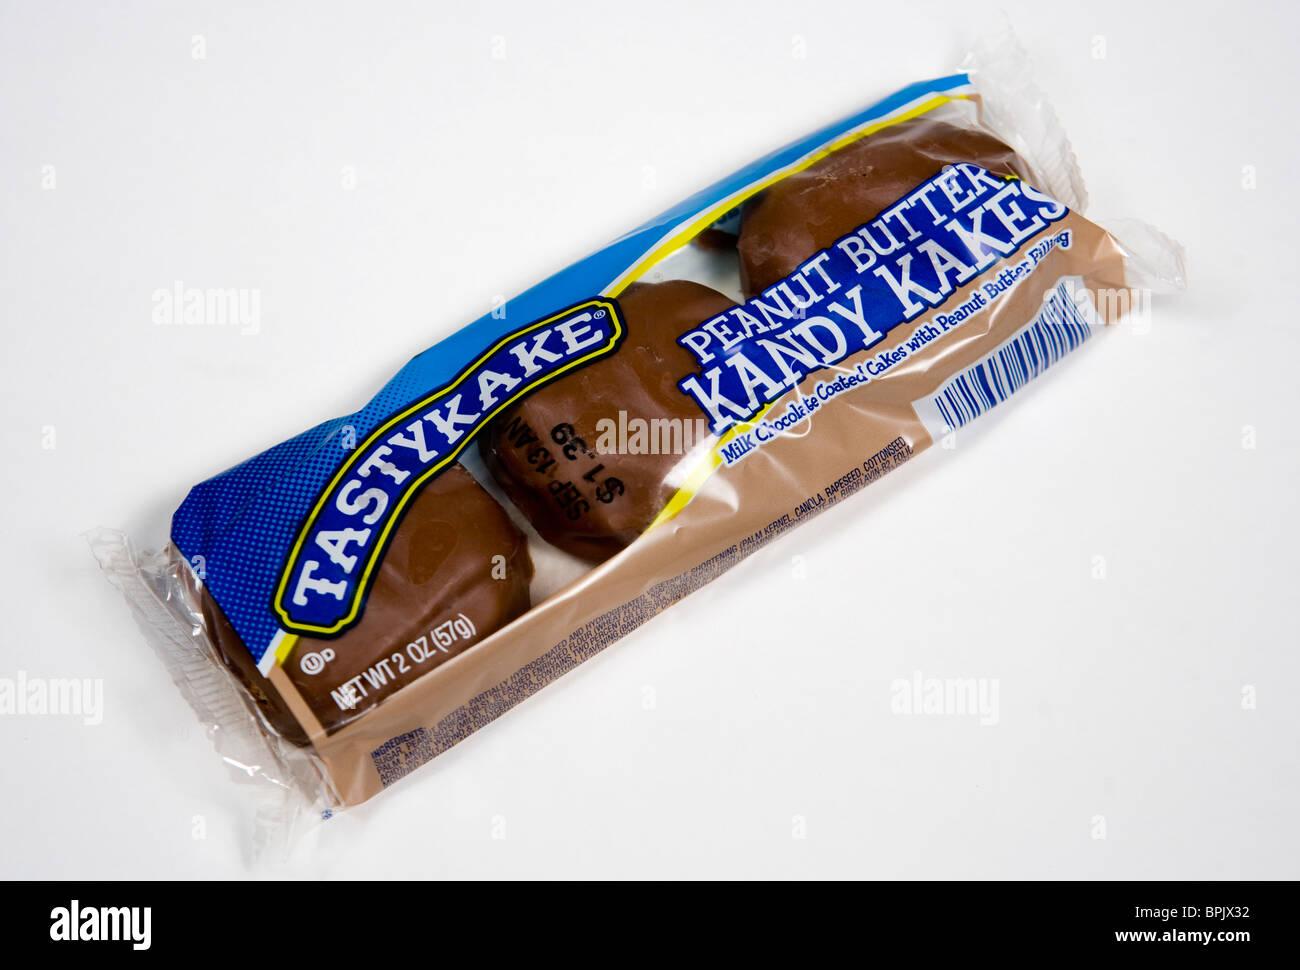 Peanut Butter Tasty Cakes